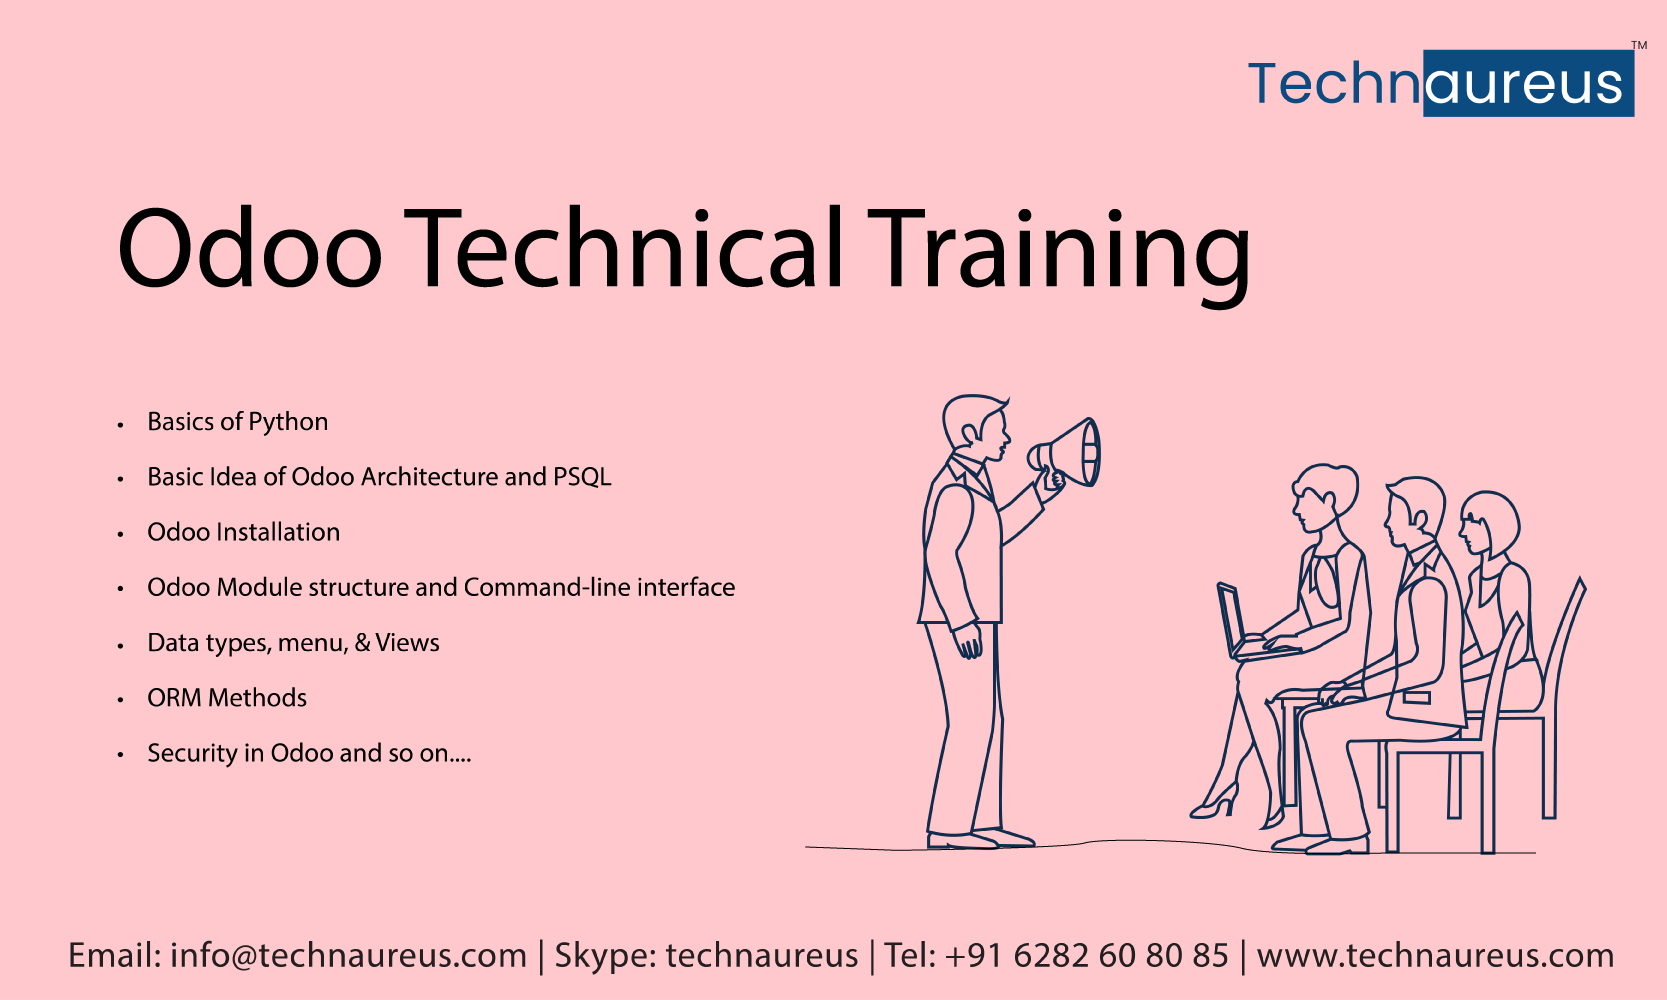 Odoo Training Train, Knowledge, Functional training